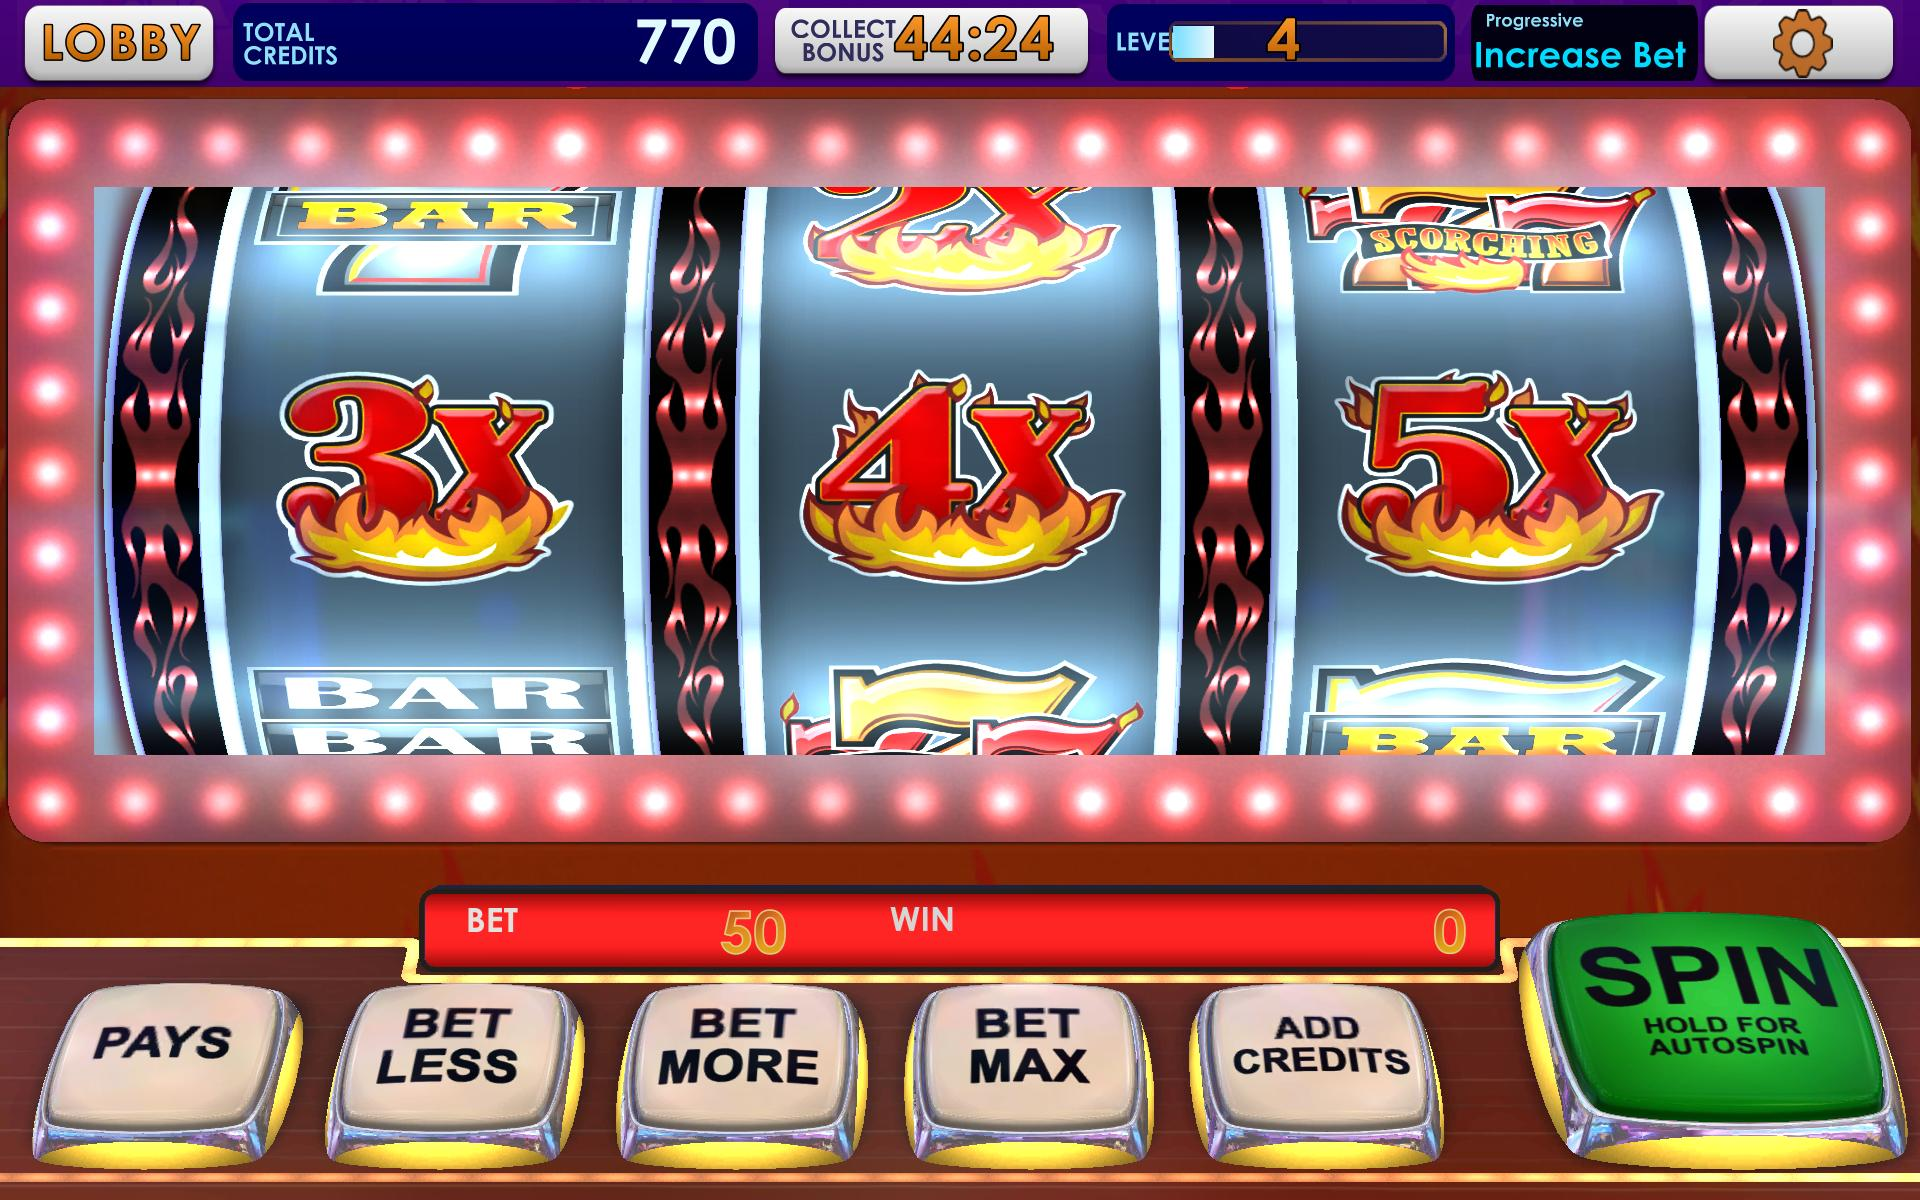 Leo vegas casino welcome bonus